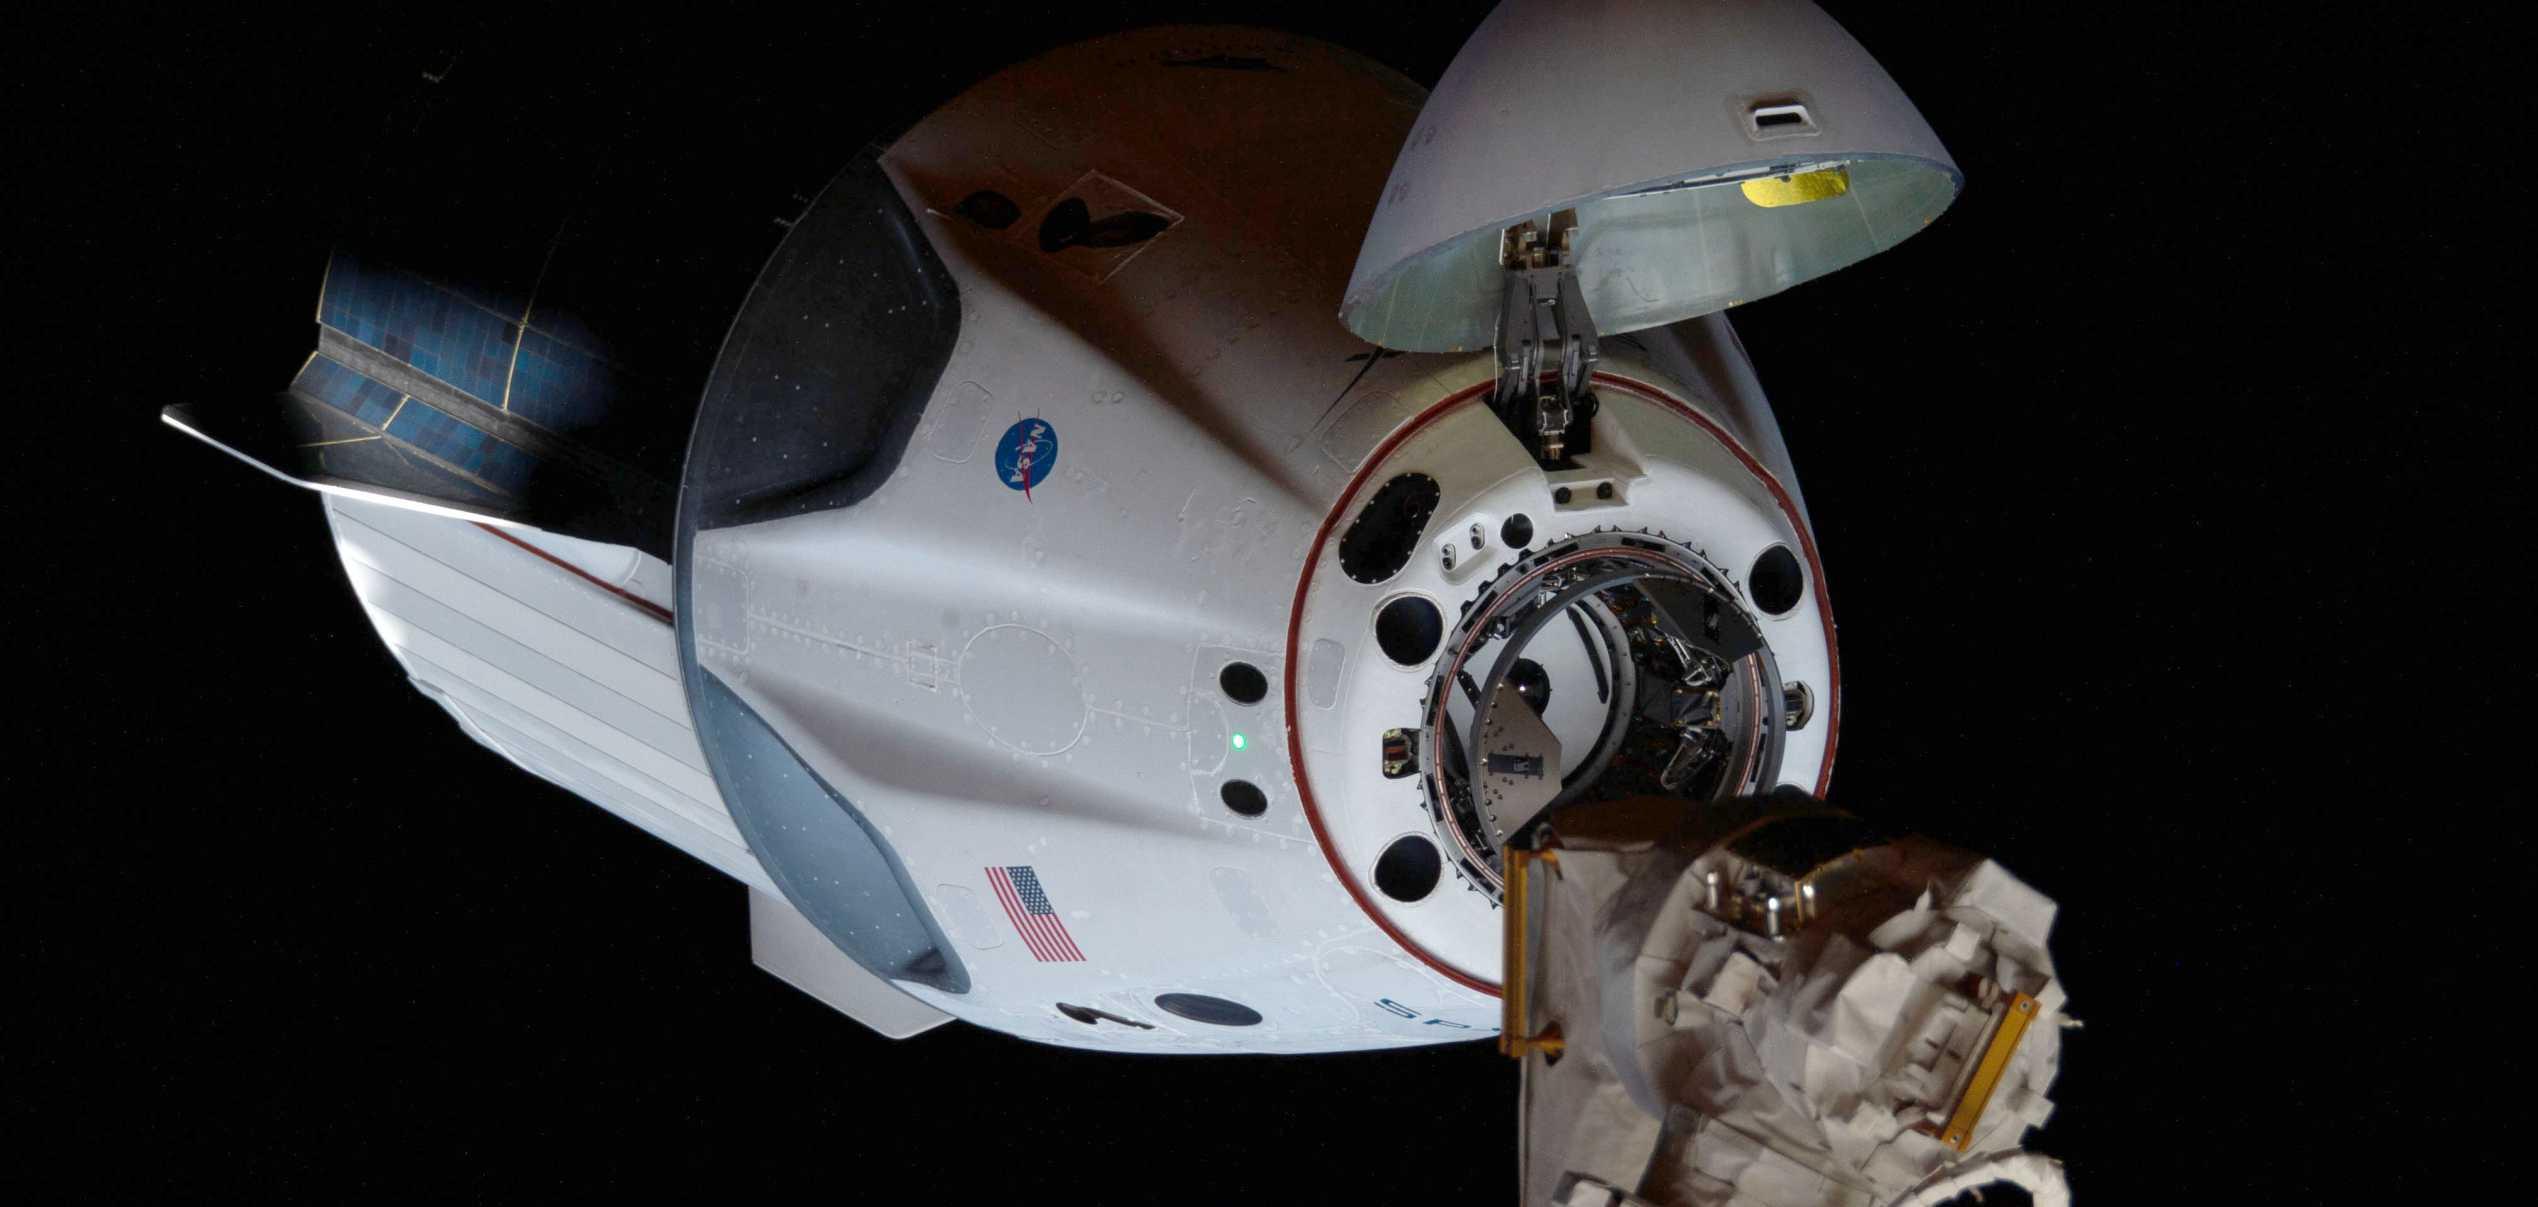 Crew Dragon C206 Demo-2 ISS arrival 053120 (NASA) 4 crop (c)